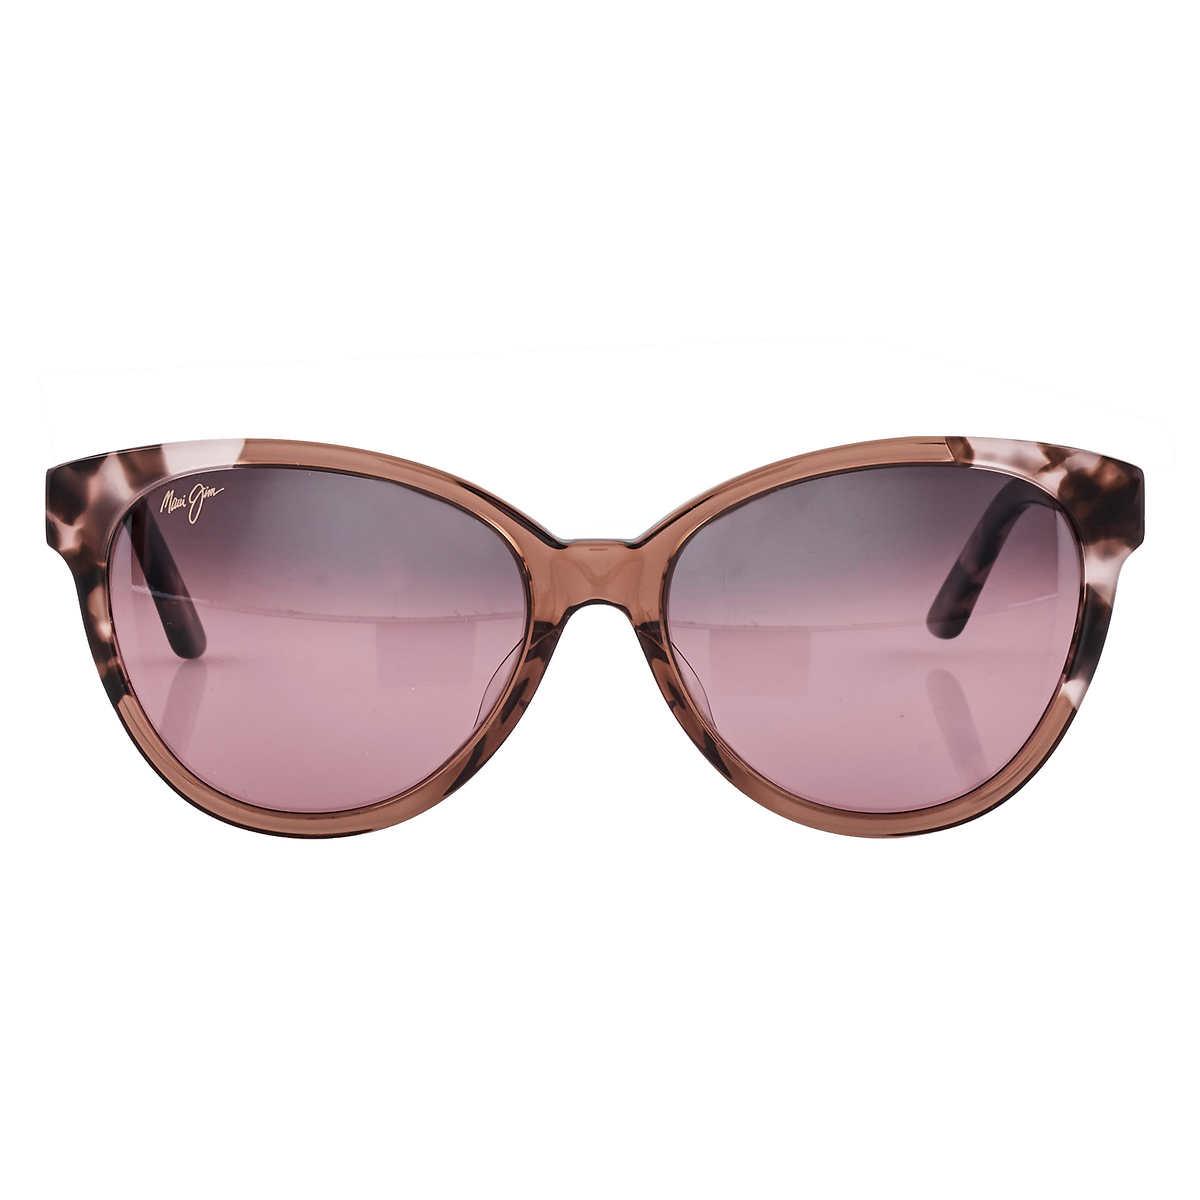 174c91cefdc5 ... Maui Jim Sunshine Pink with Pink Tokyo Sunglasses. 1 1